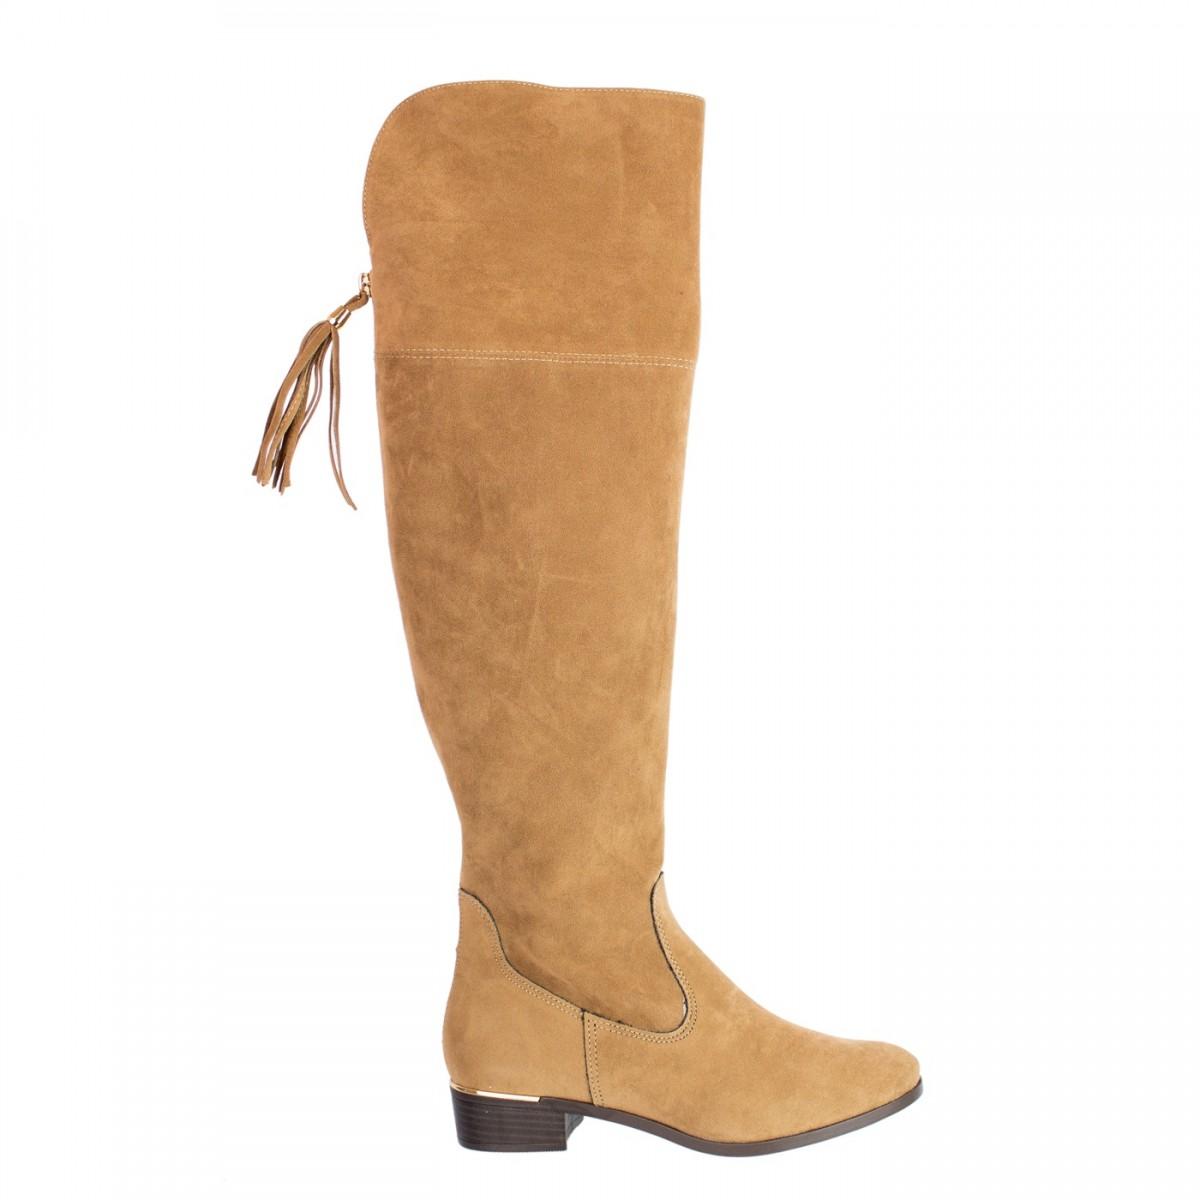 1f89c86c4d Bizz Store - Bota Over Knee Feminina Via Marte Camurça Preta